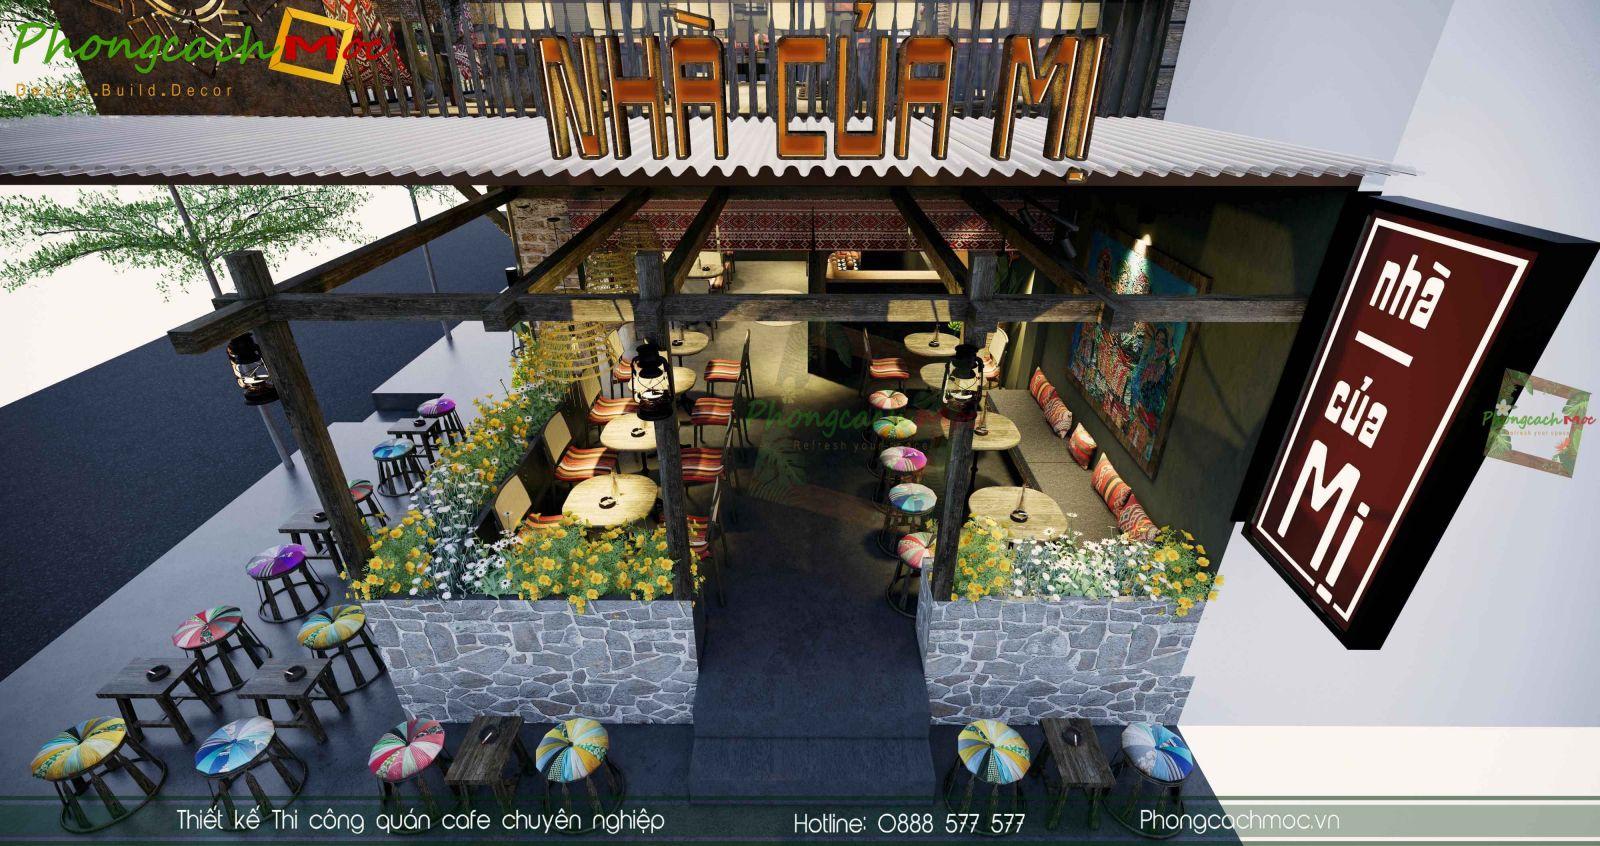 Thiet-ke-quan-cafe-Nha-cua-mi-Binh-Thanh29